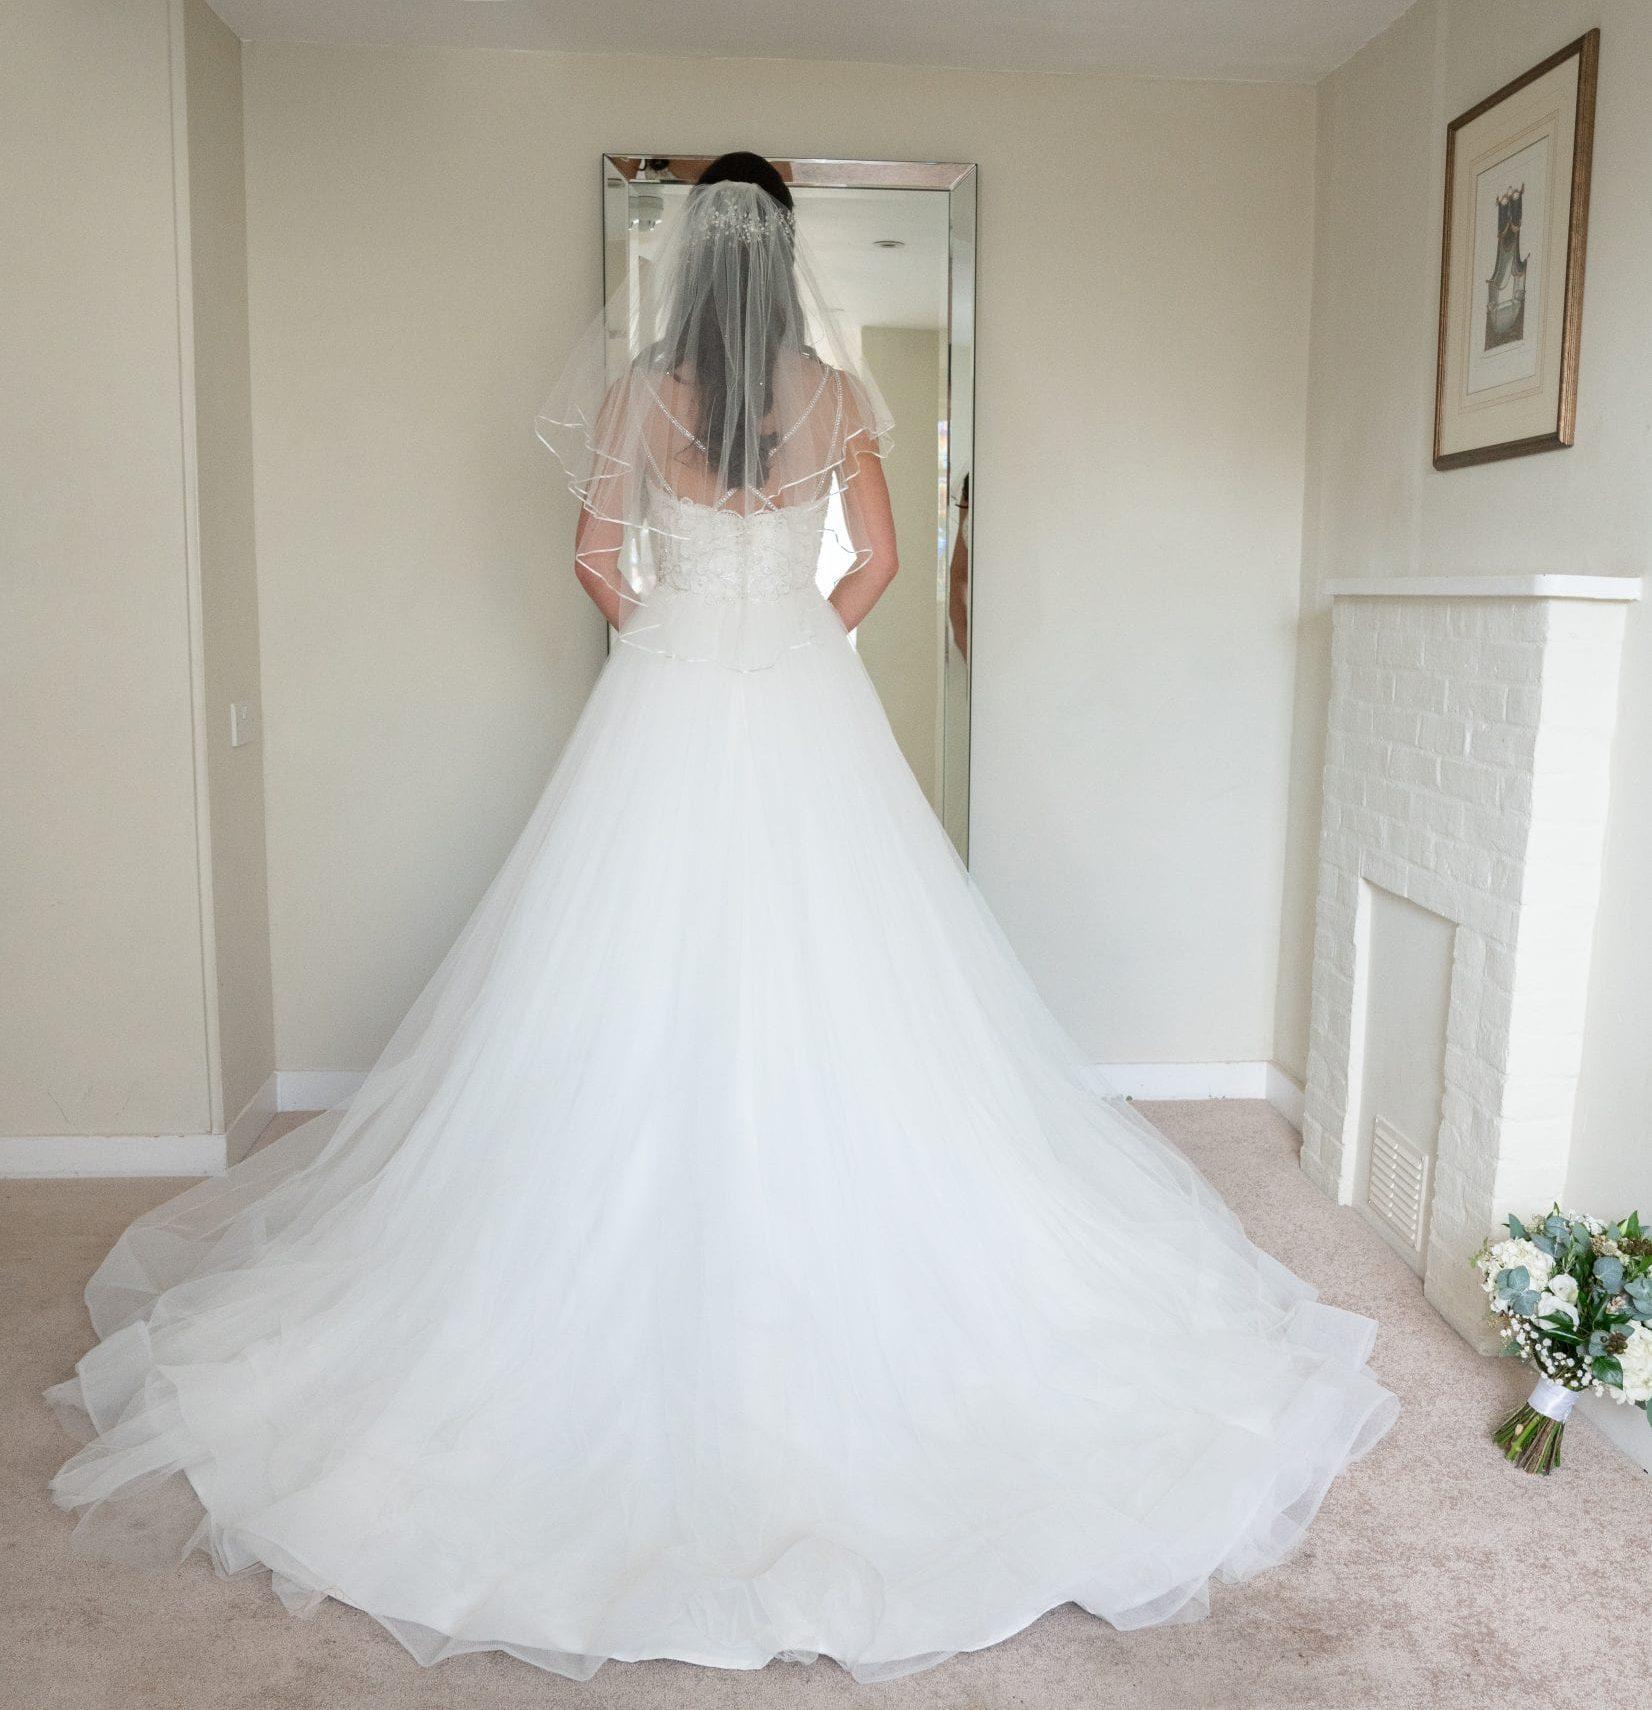 Farnham Castle offers a private bridal dressing room